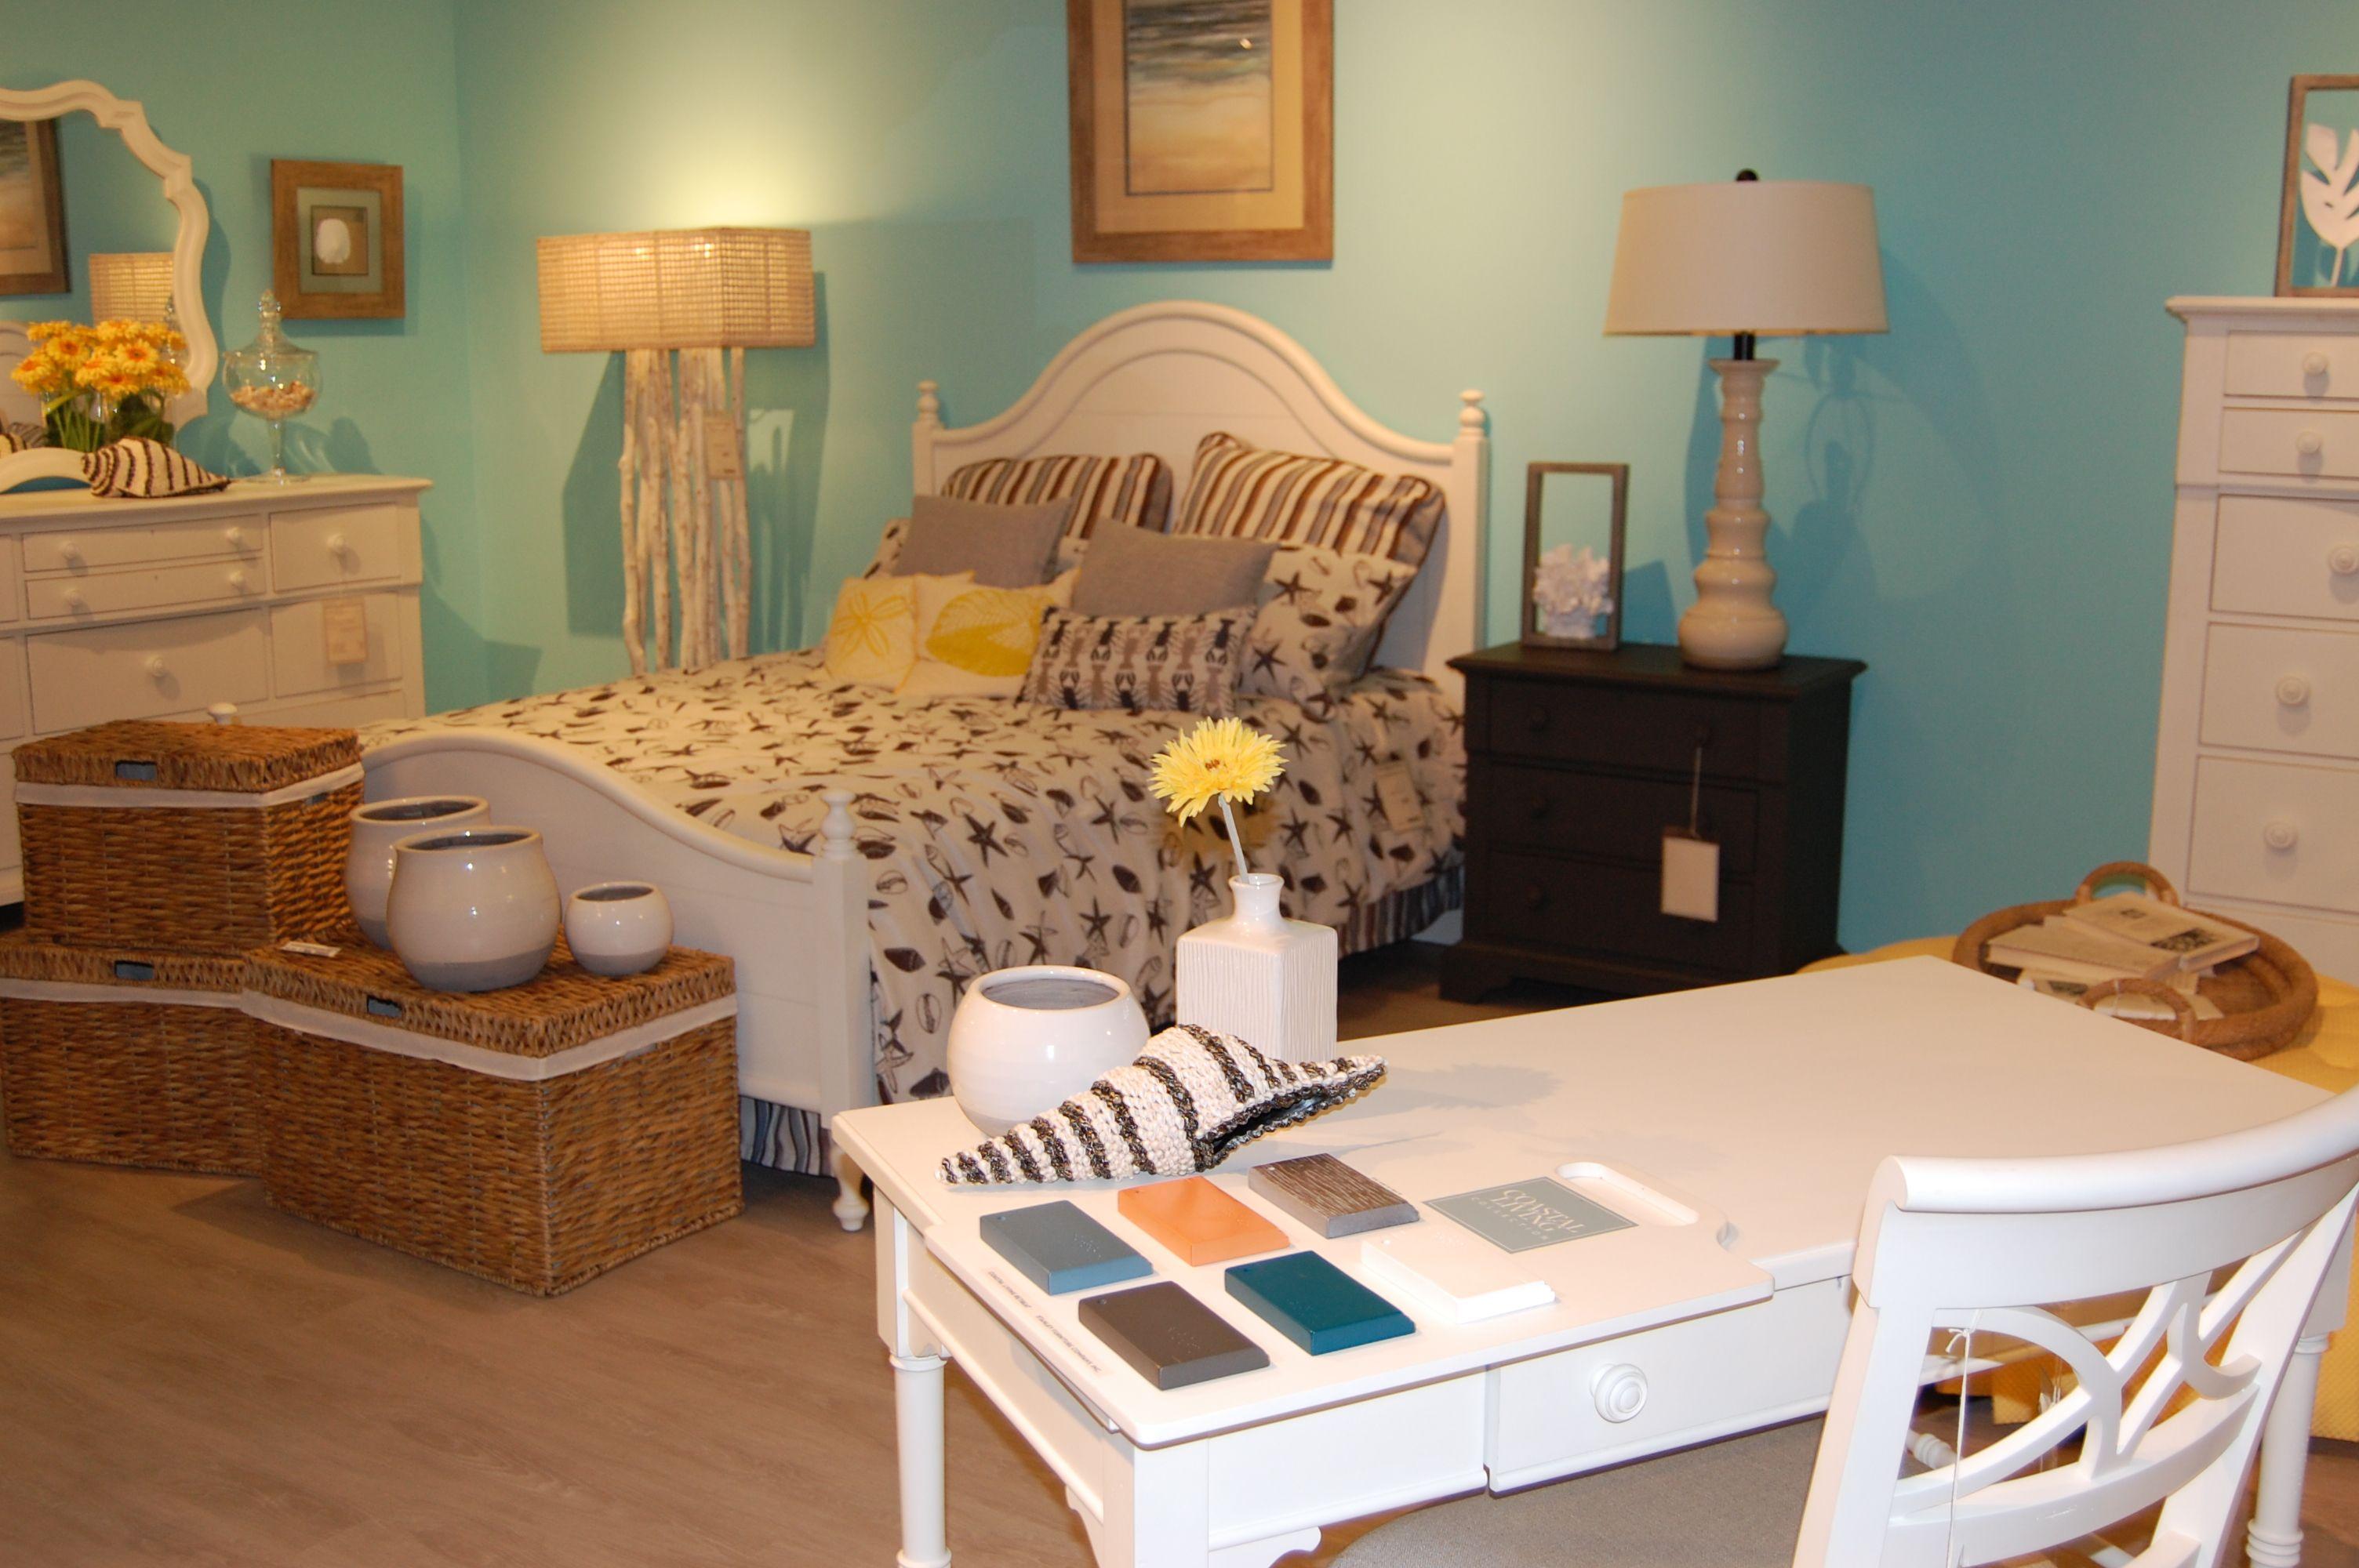 cardisfurniture cardis furniture inspiration inspire